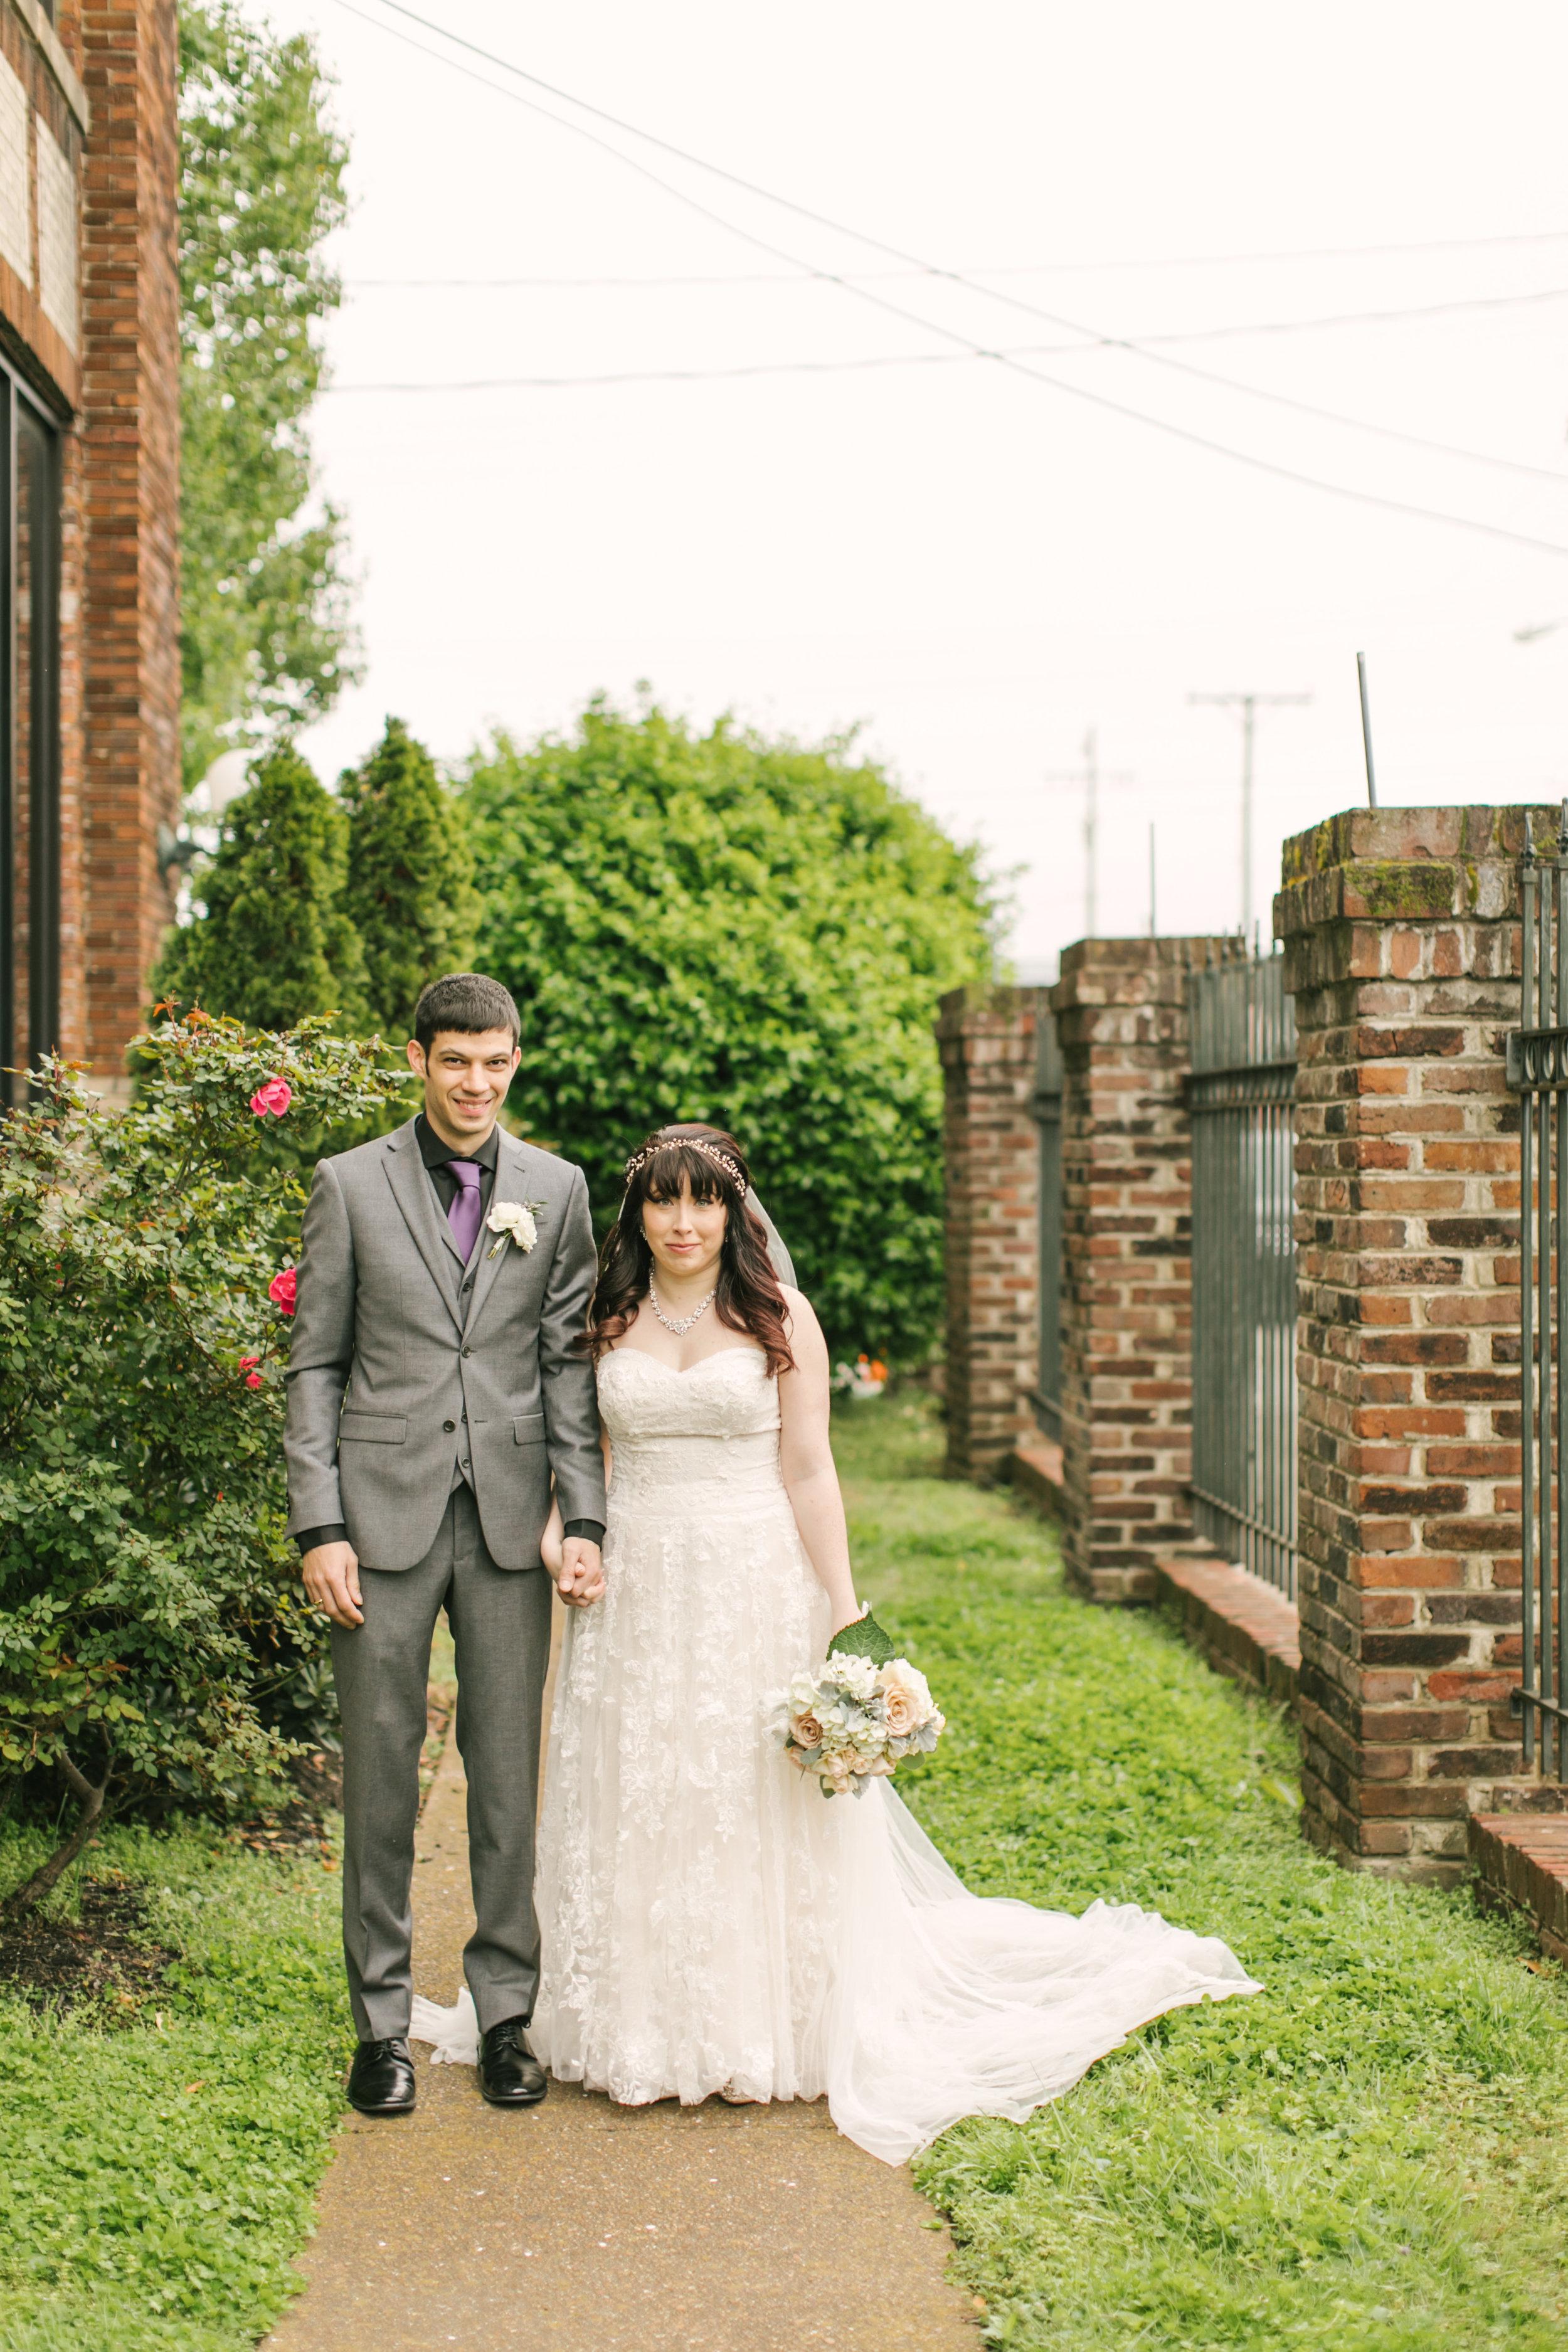 233_Colin+Jessica_Wedding.jpg